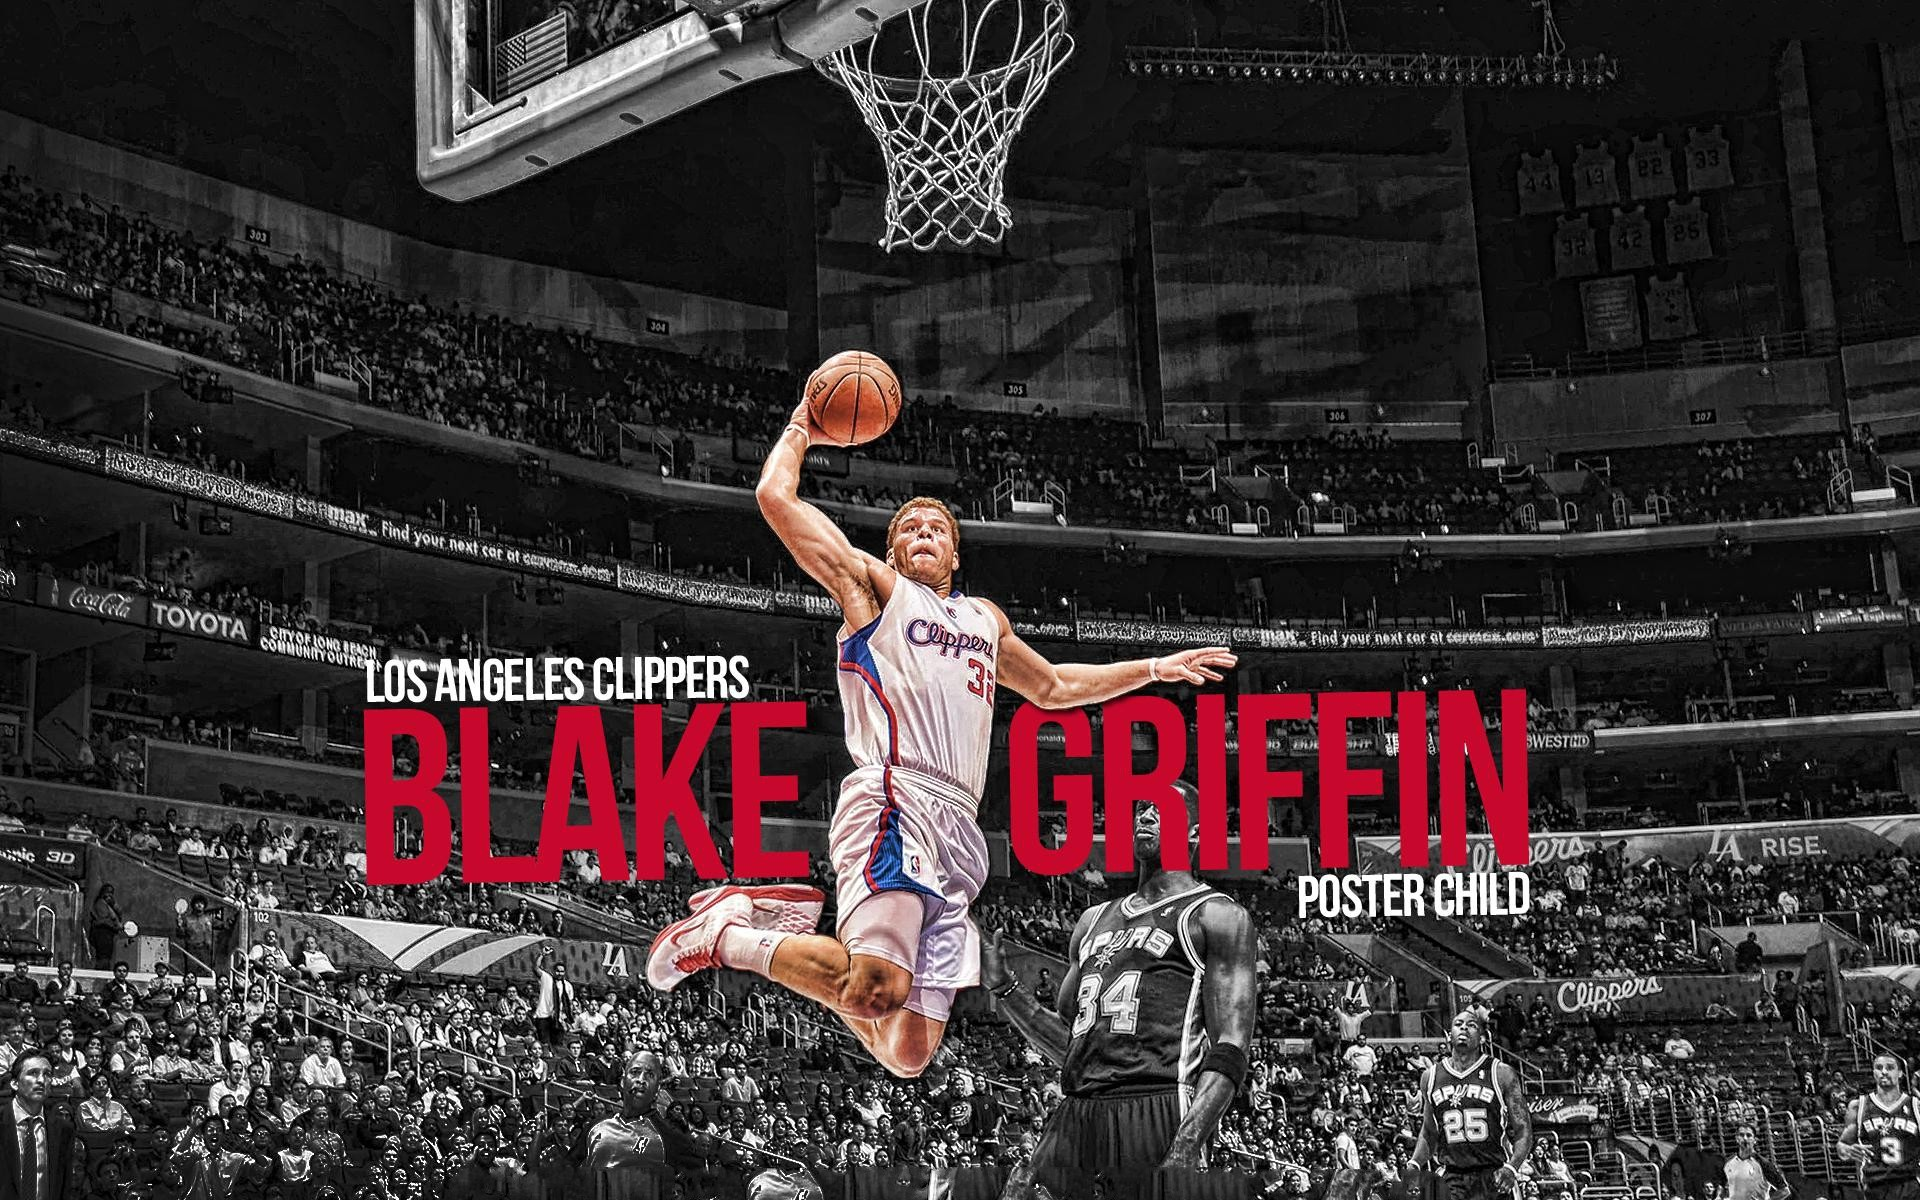 Blake Griffin Dunk Wallpaper HD.